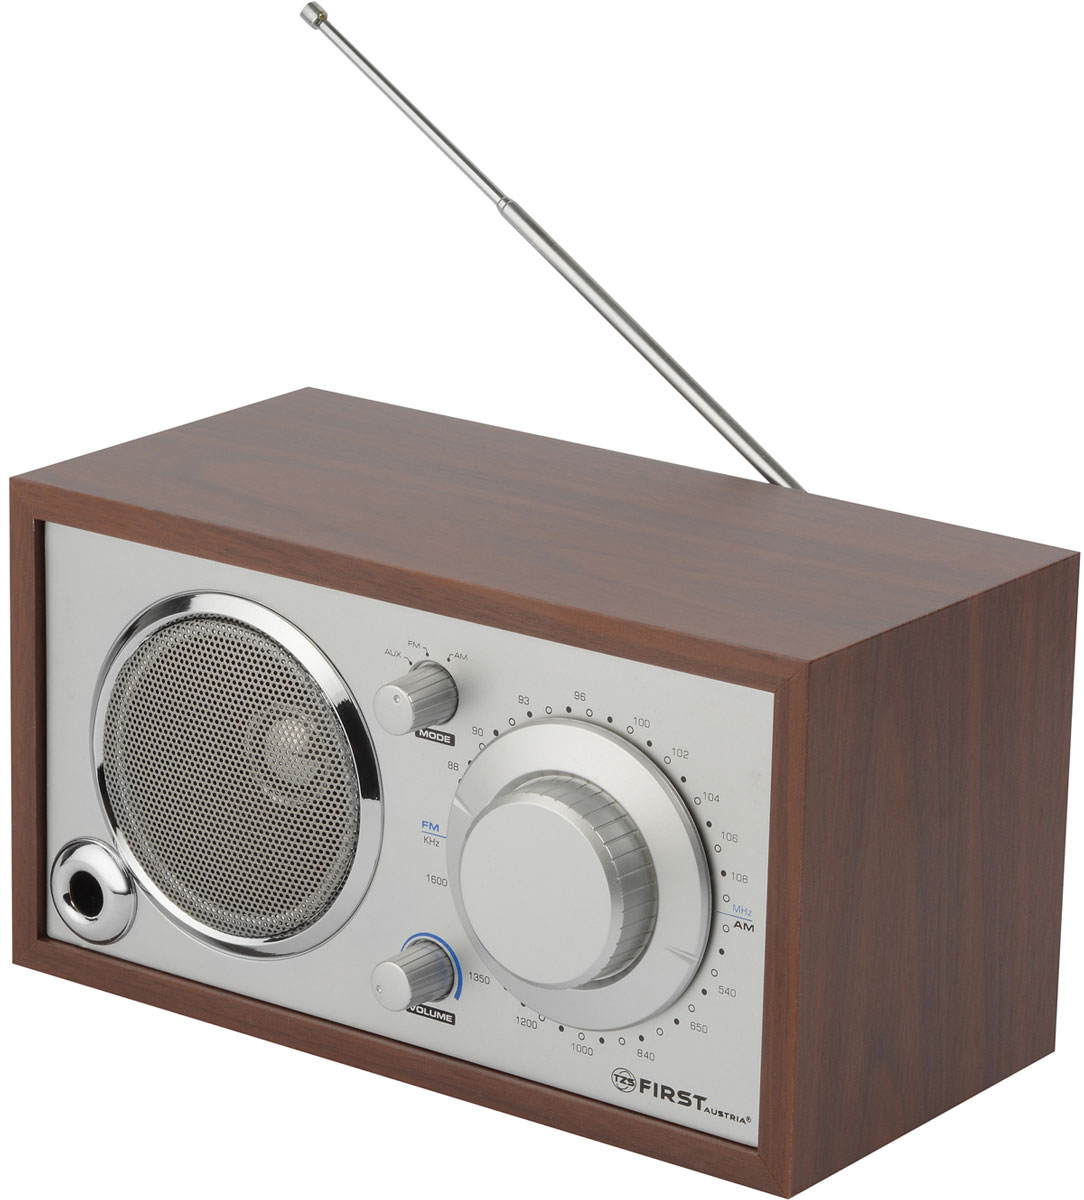 First FA-1907, Silver Wood радиоприемник